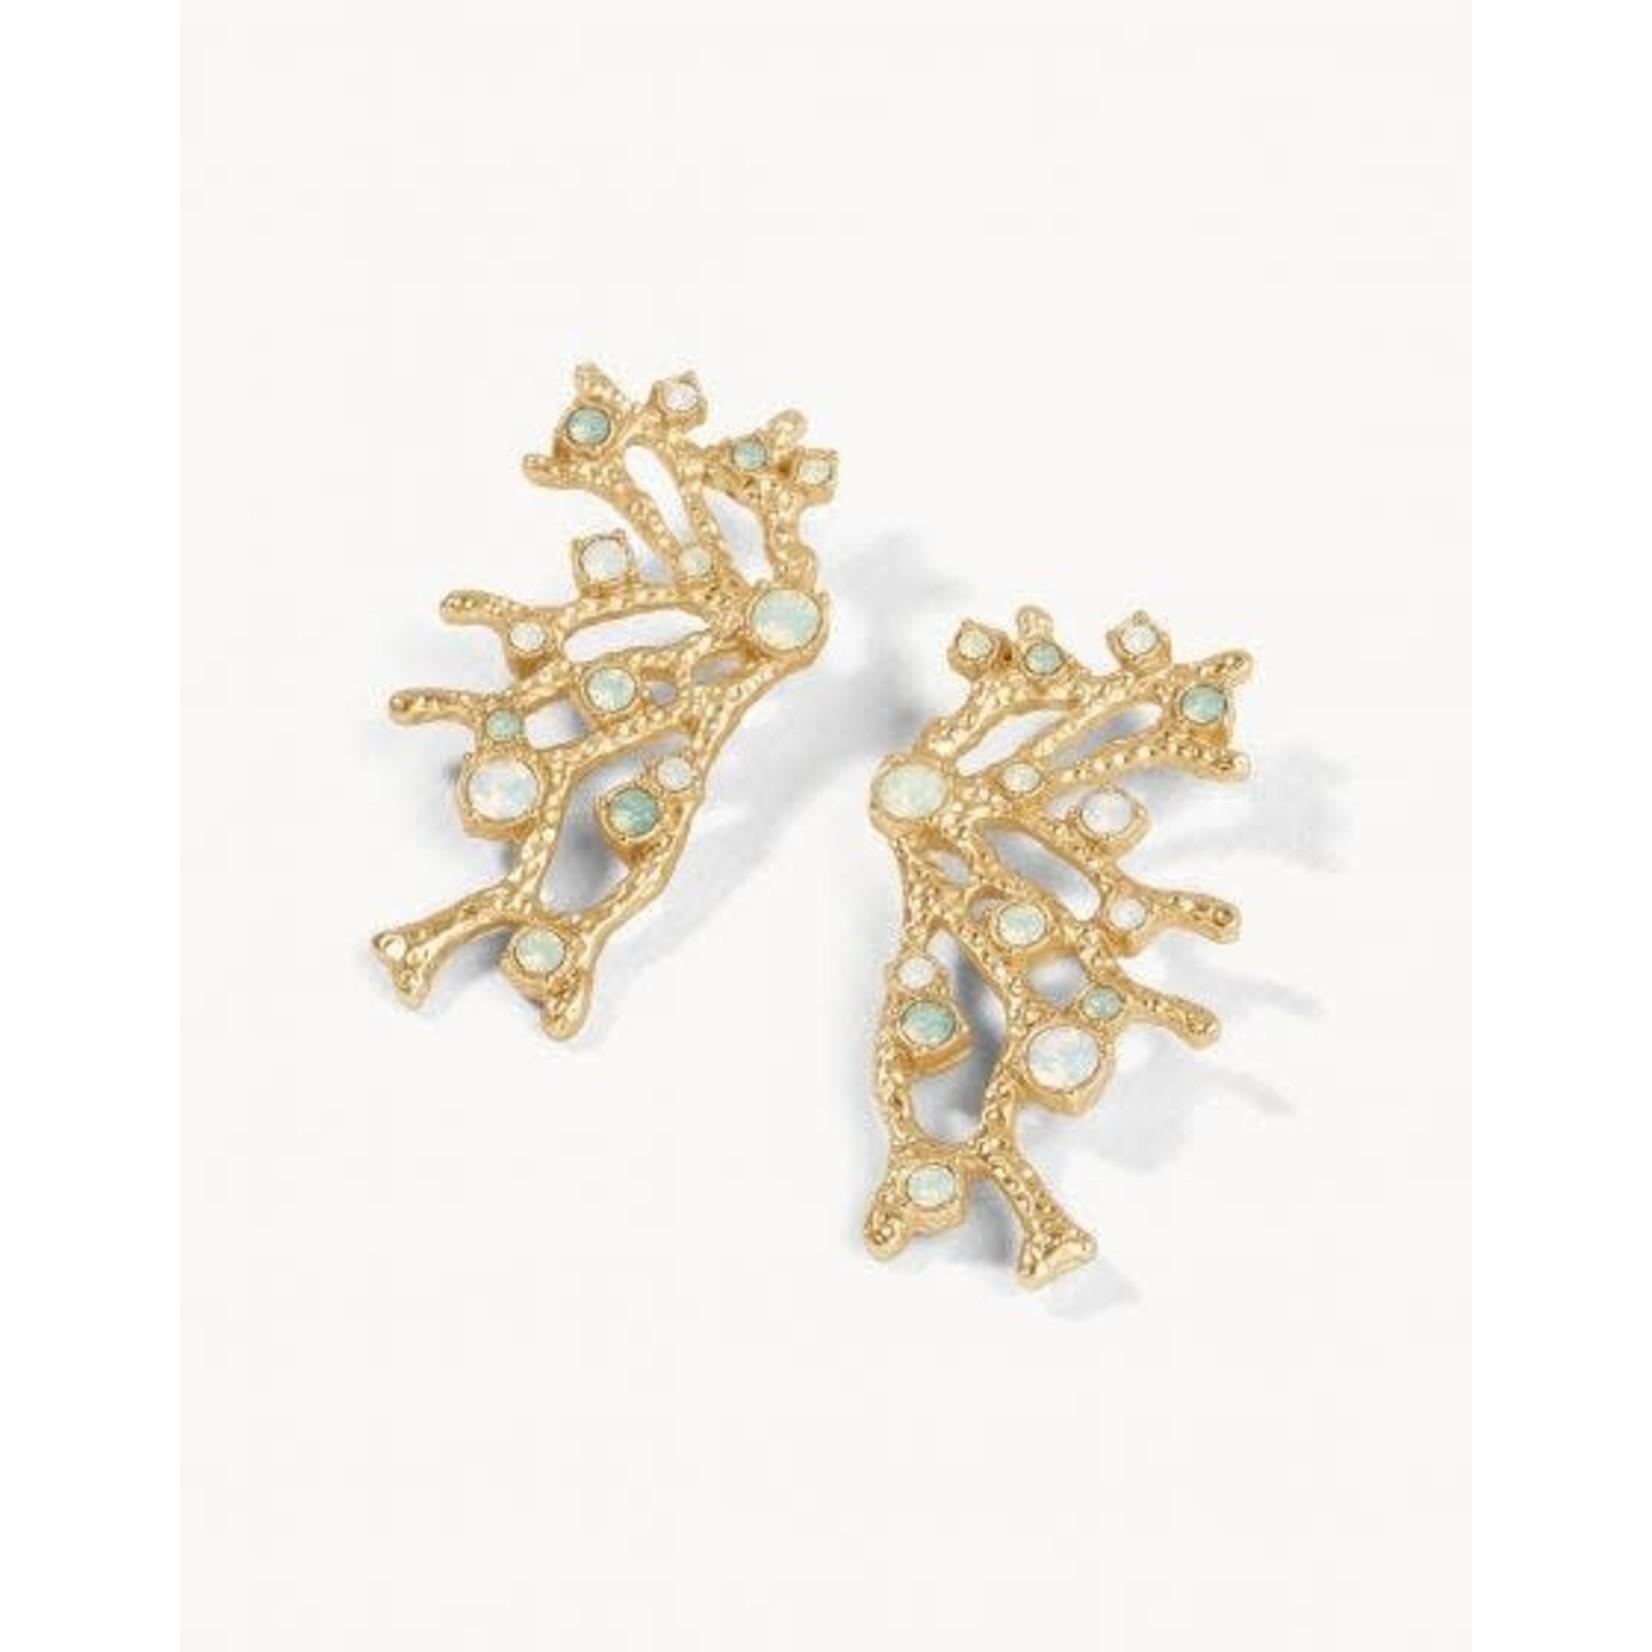 Spartina Earrings/Coral Fan Statement/Opal